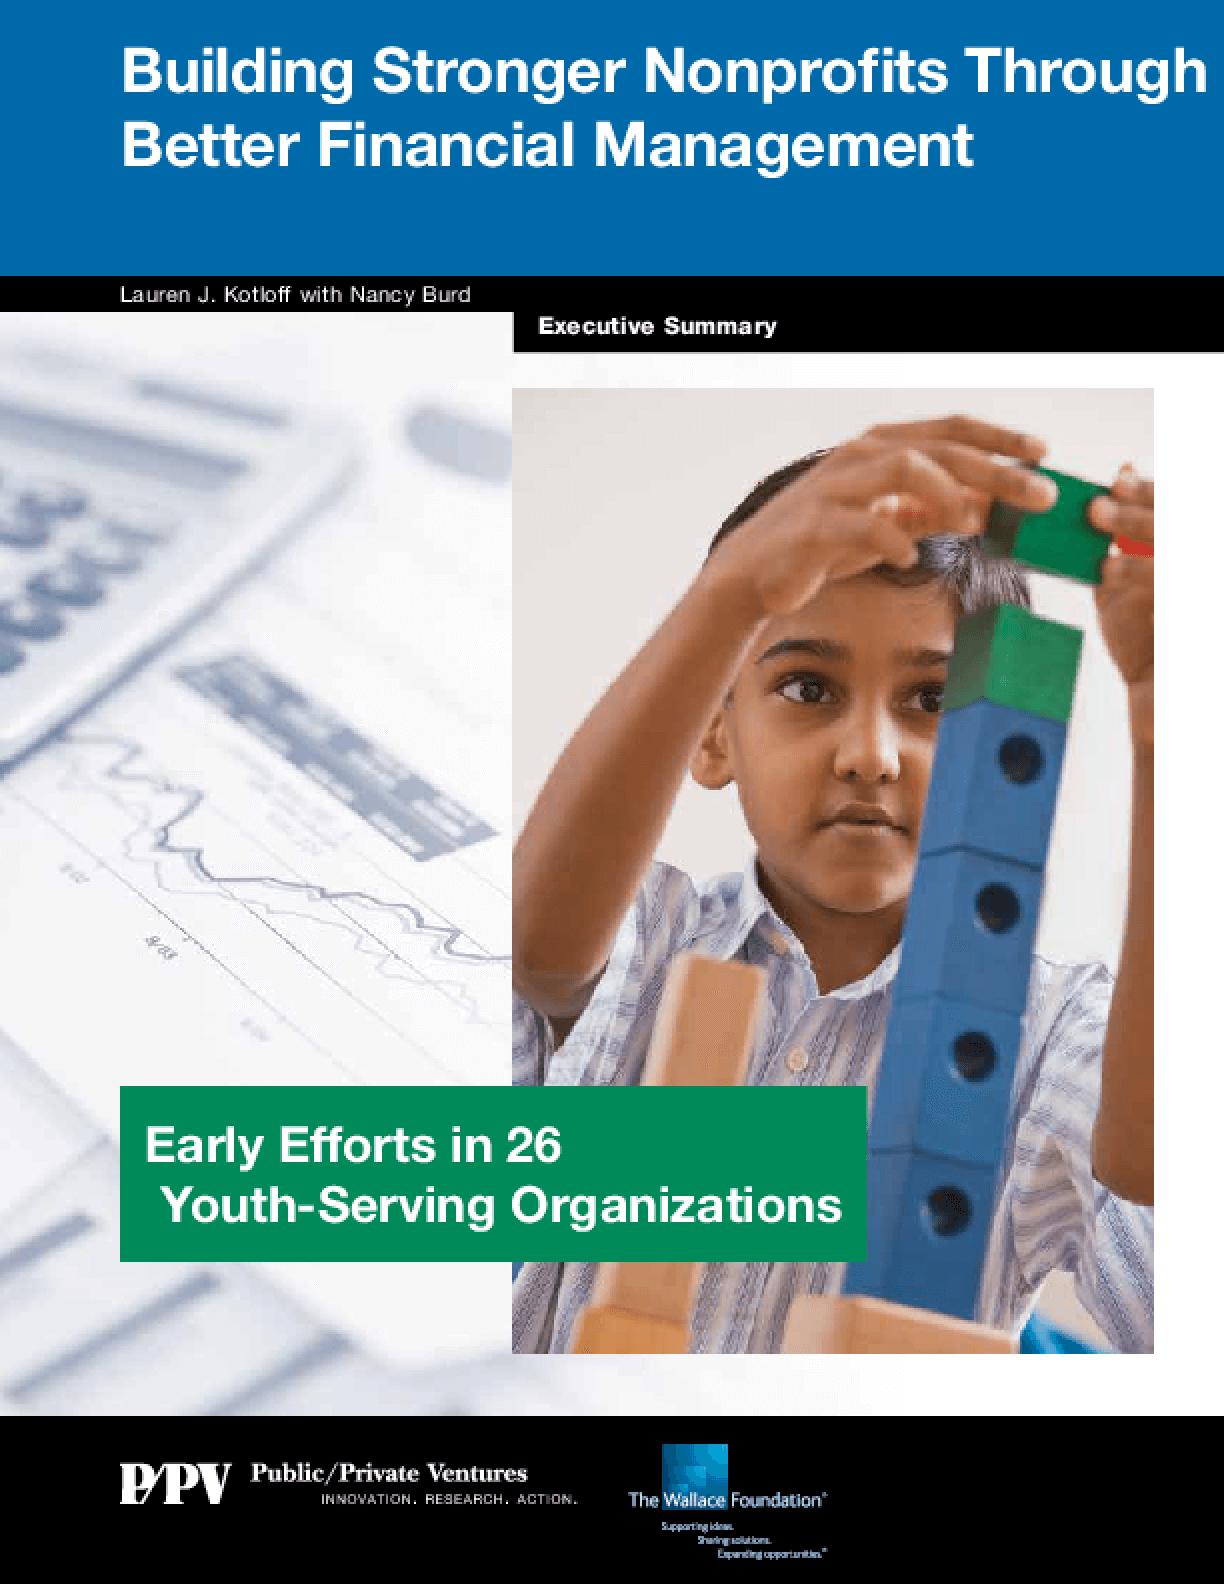 Building Stronger Nonprofits Through Better Financial Management, Executive Summary